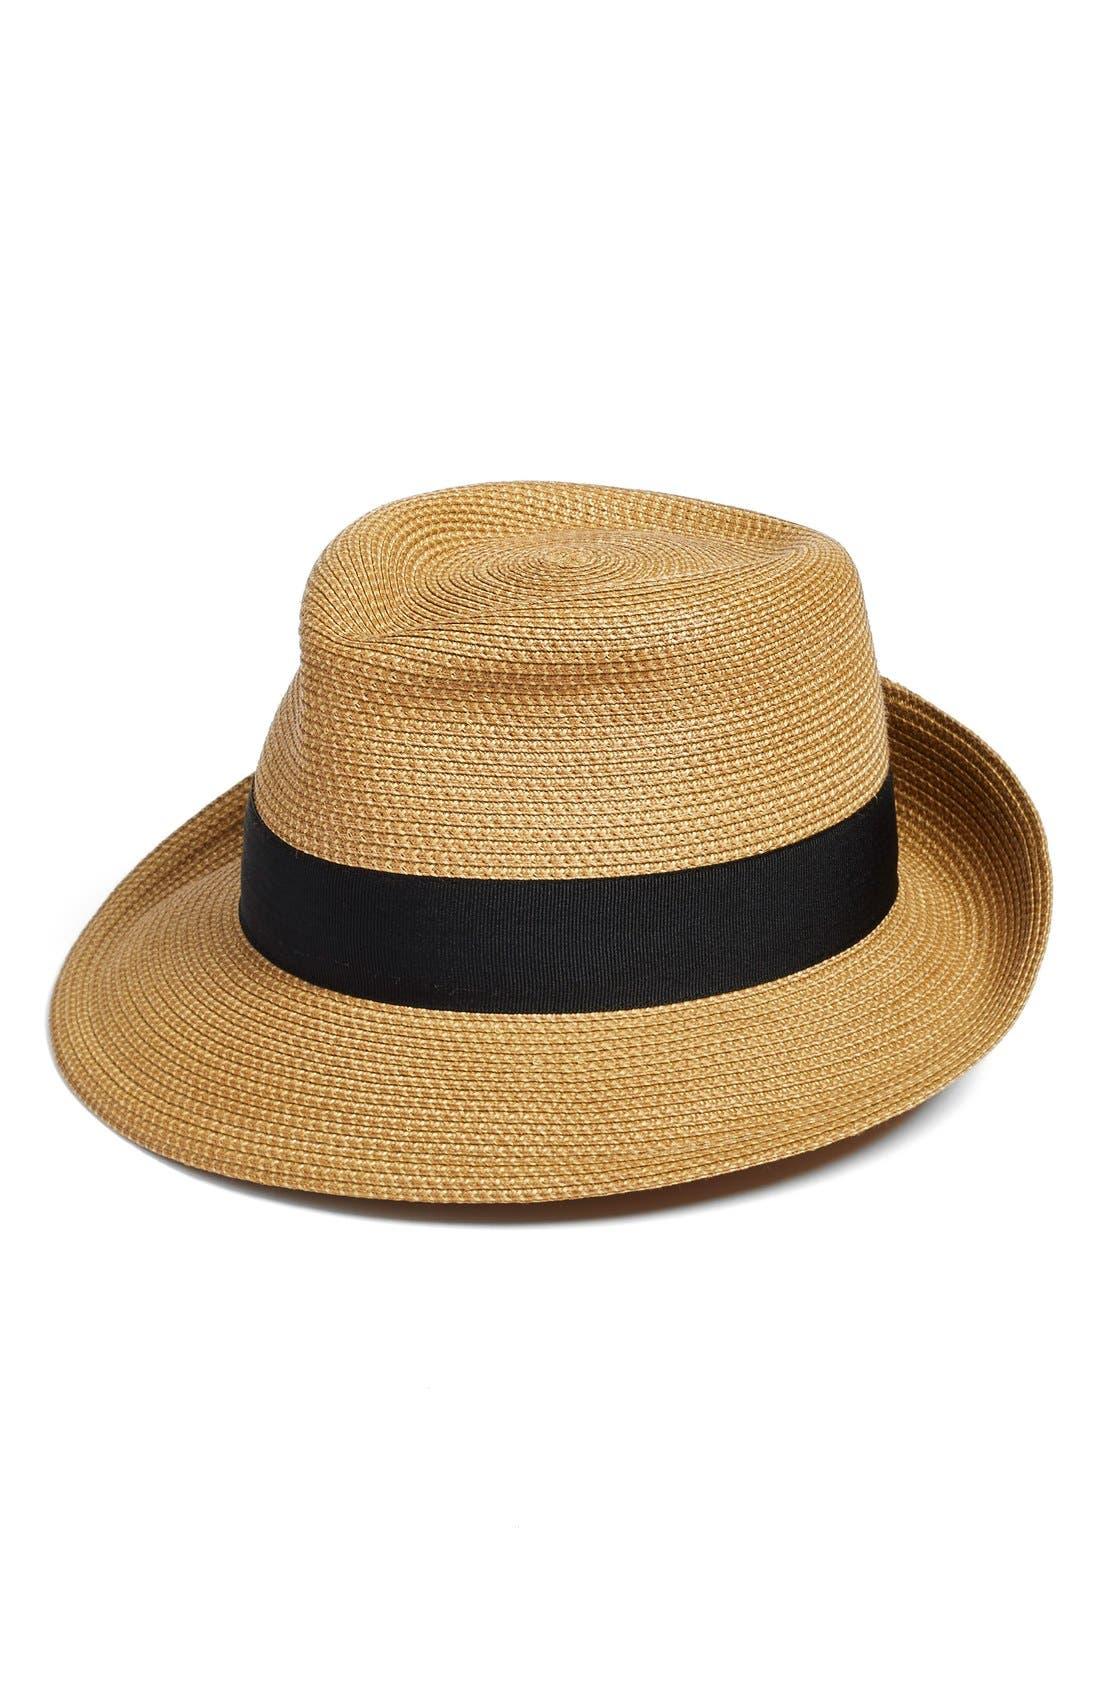 ERIC JAVITS 'Classic' Squishee Packable Fedora Sun Hat - Beige in Natural/ Black